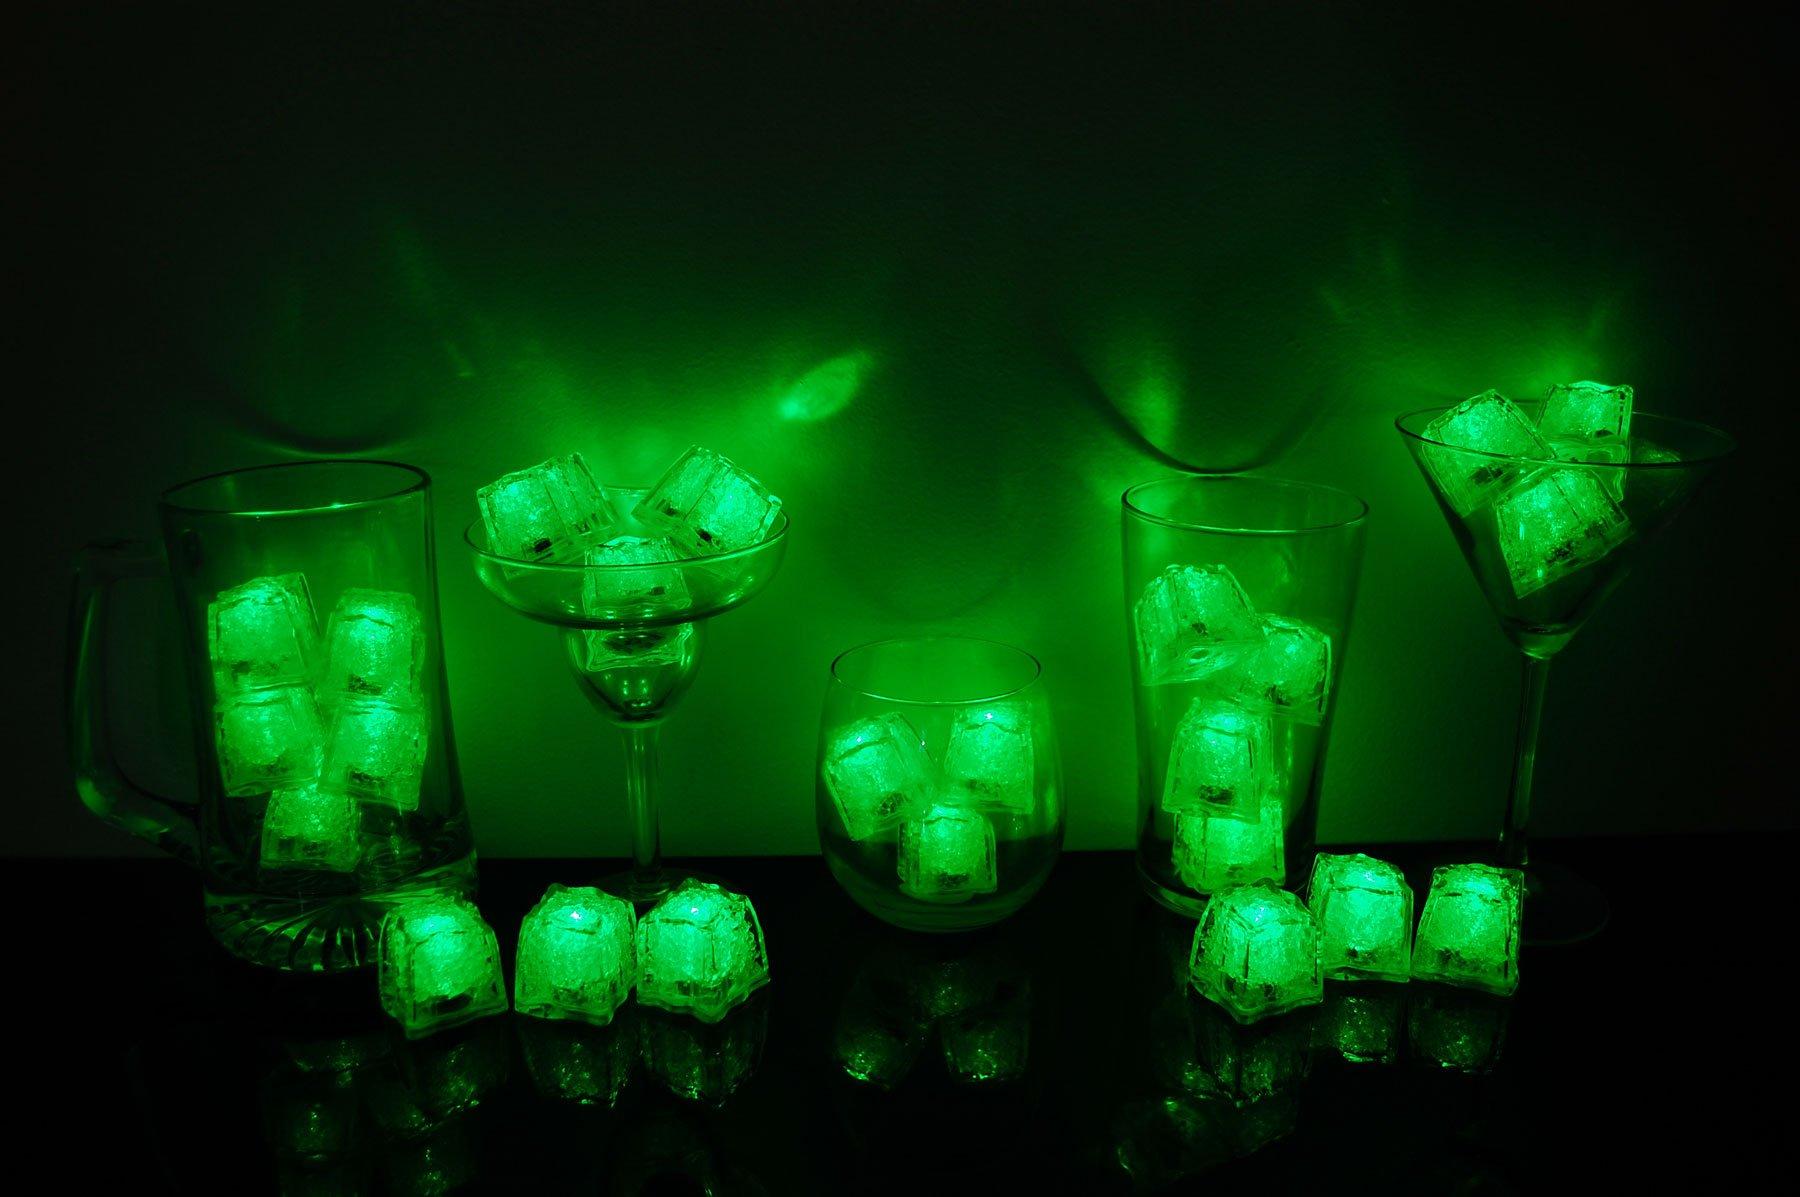 Litecubes Brand 3 Mode Green Light up LED Ice Cubes (24)